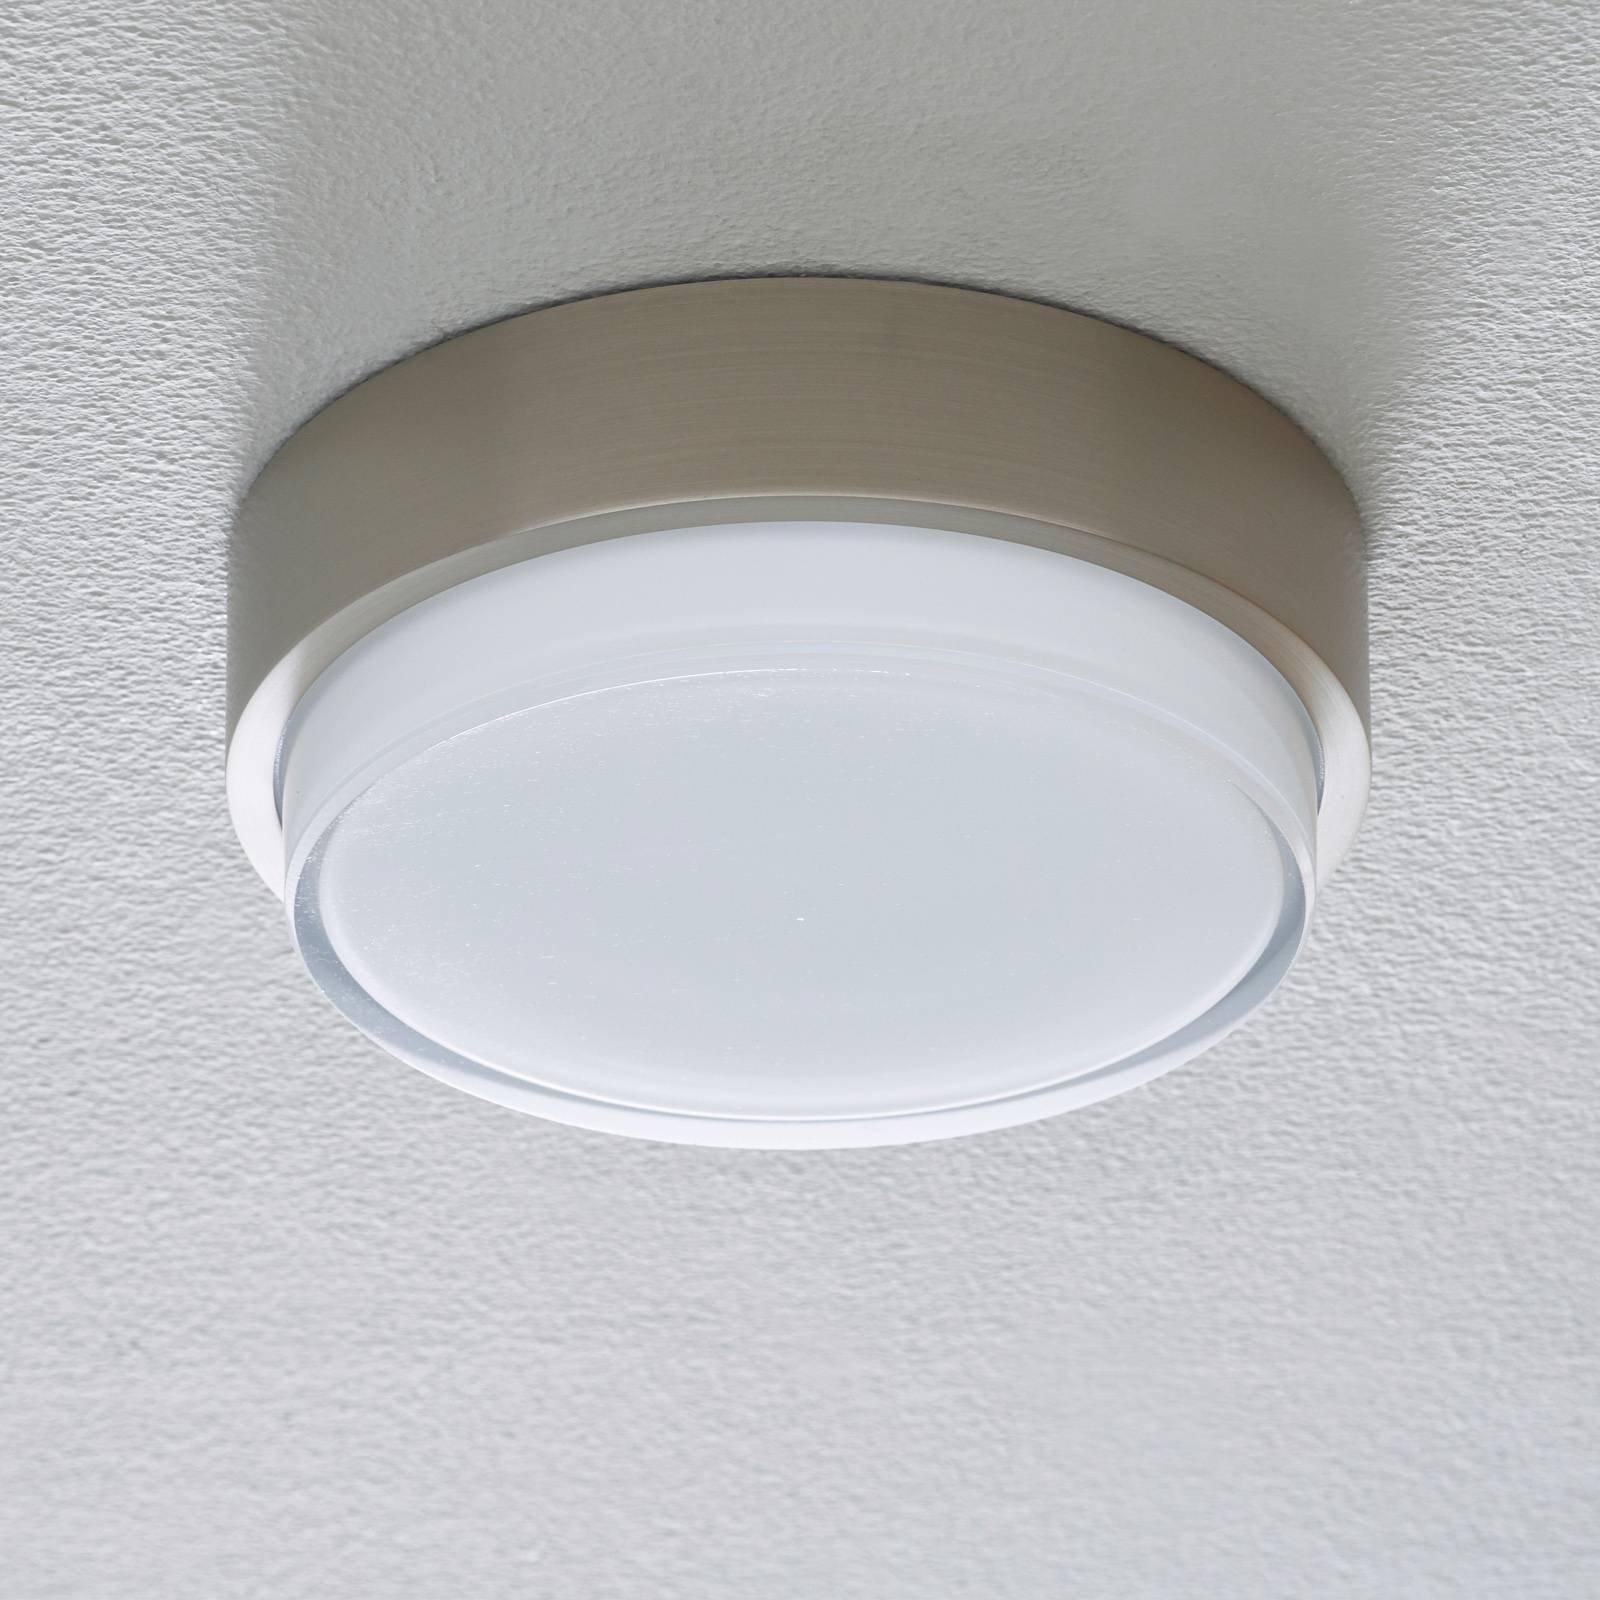 BEGA 50536 LED-taklampe 930 rustfritt stål Ø21cm